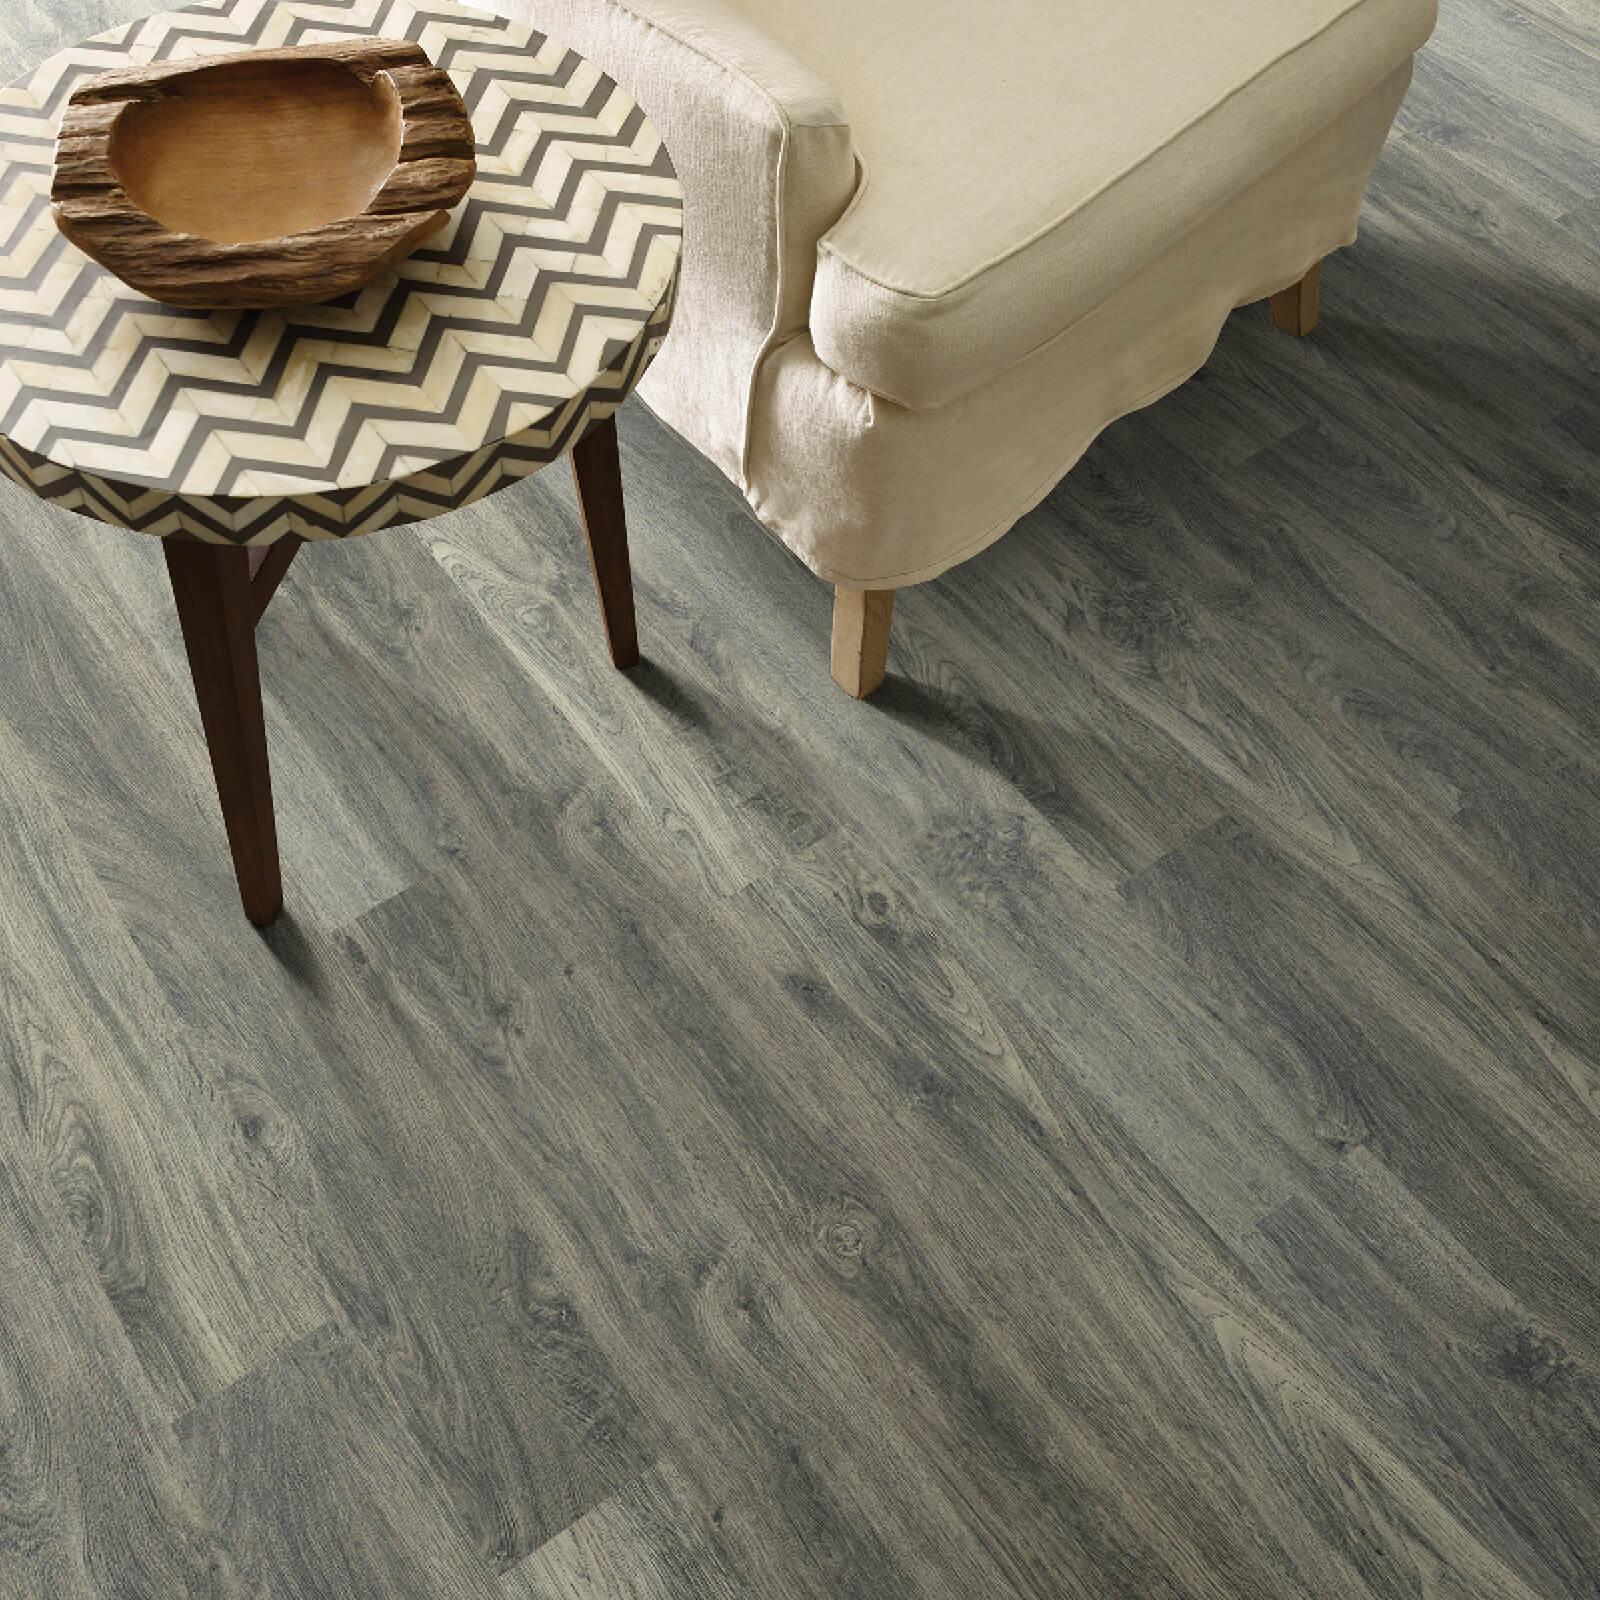 Shaw floors Gold Coast laminate | Flooring by Wilson's Carpet Plus